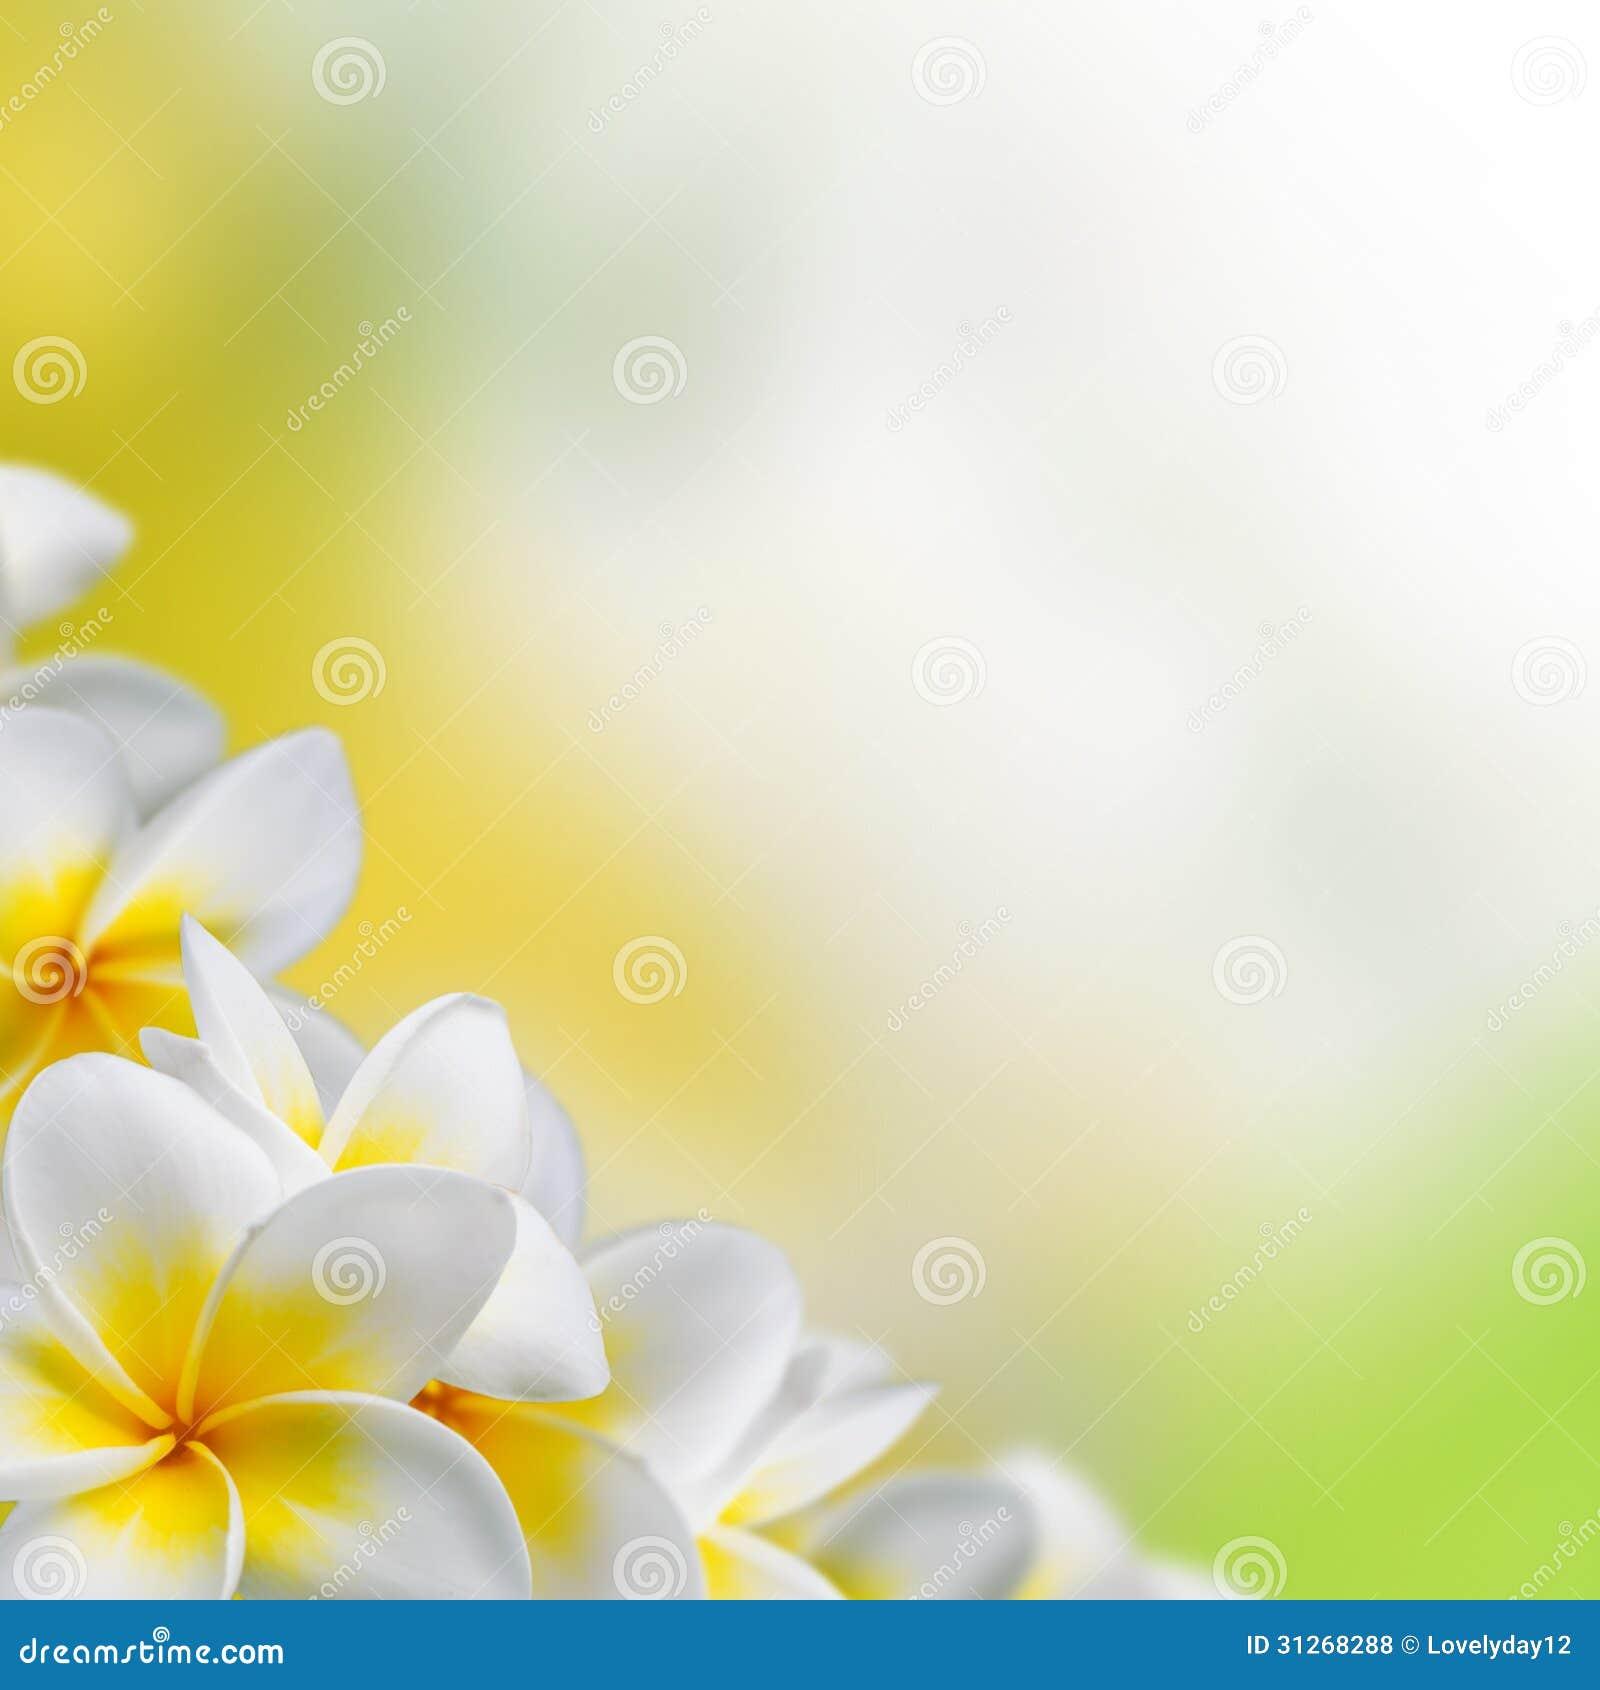 Frangipani Plumeria Flowers Border Royalty Free Stock ...